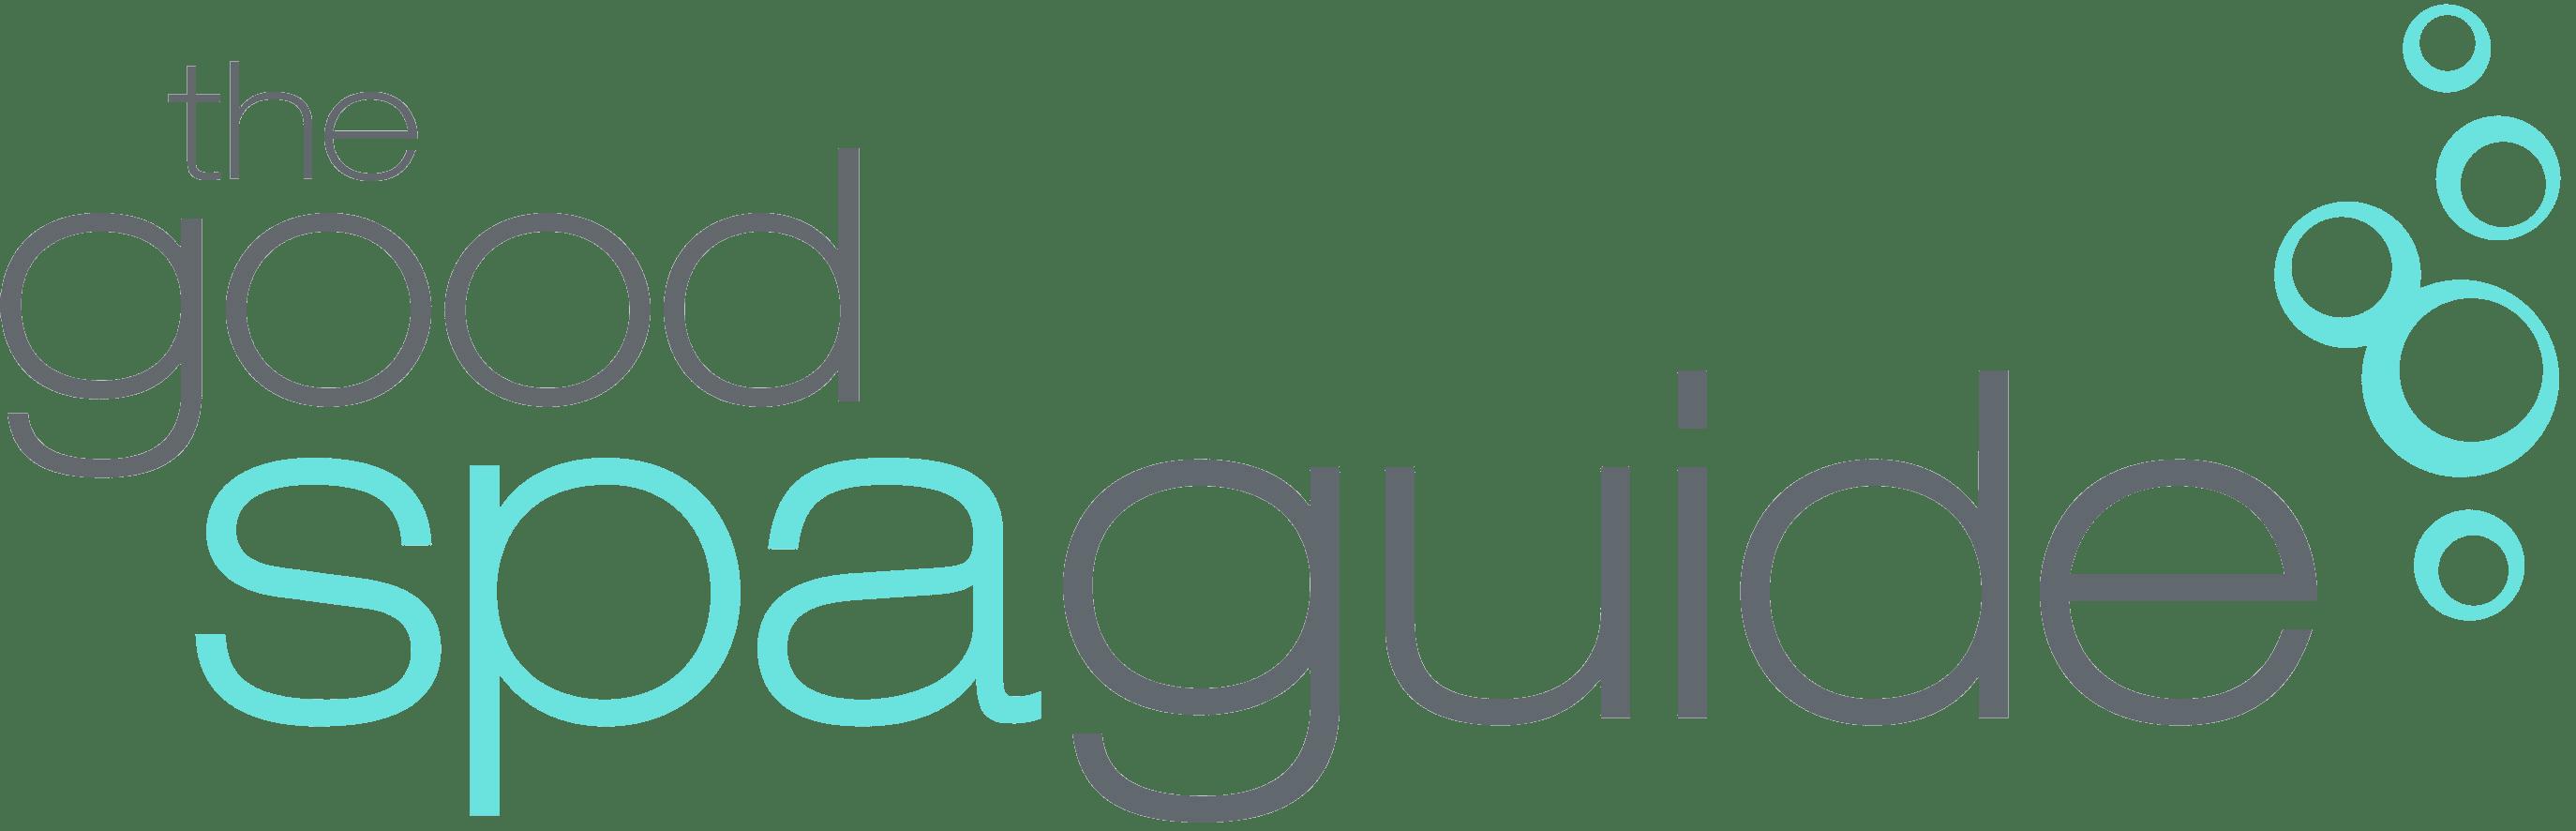 Good Spa Guide Logo